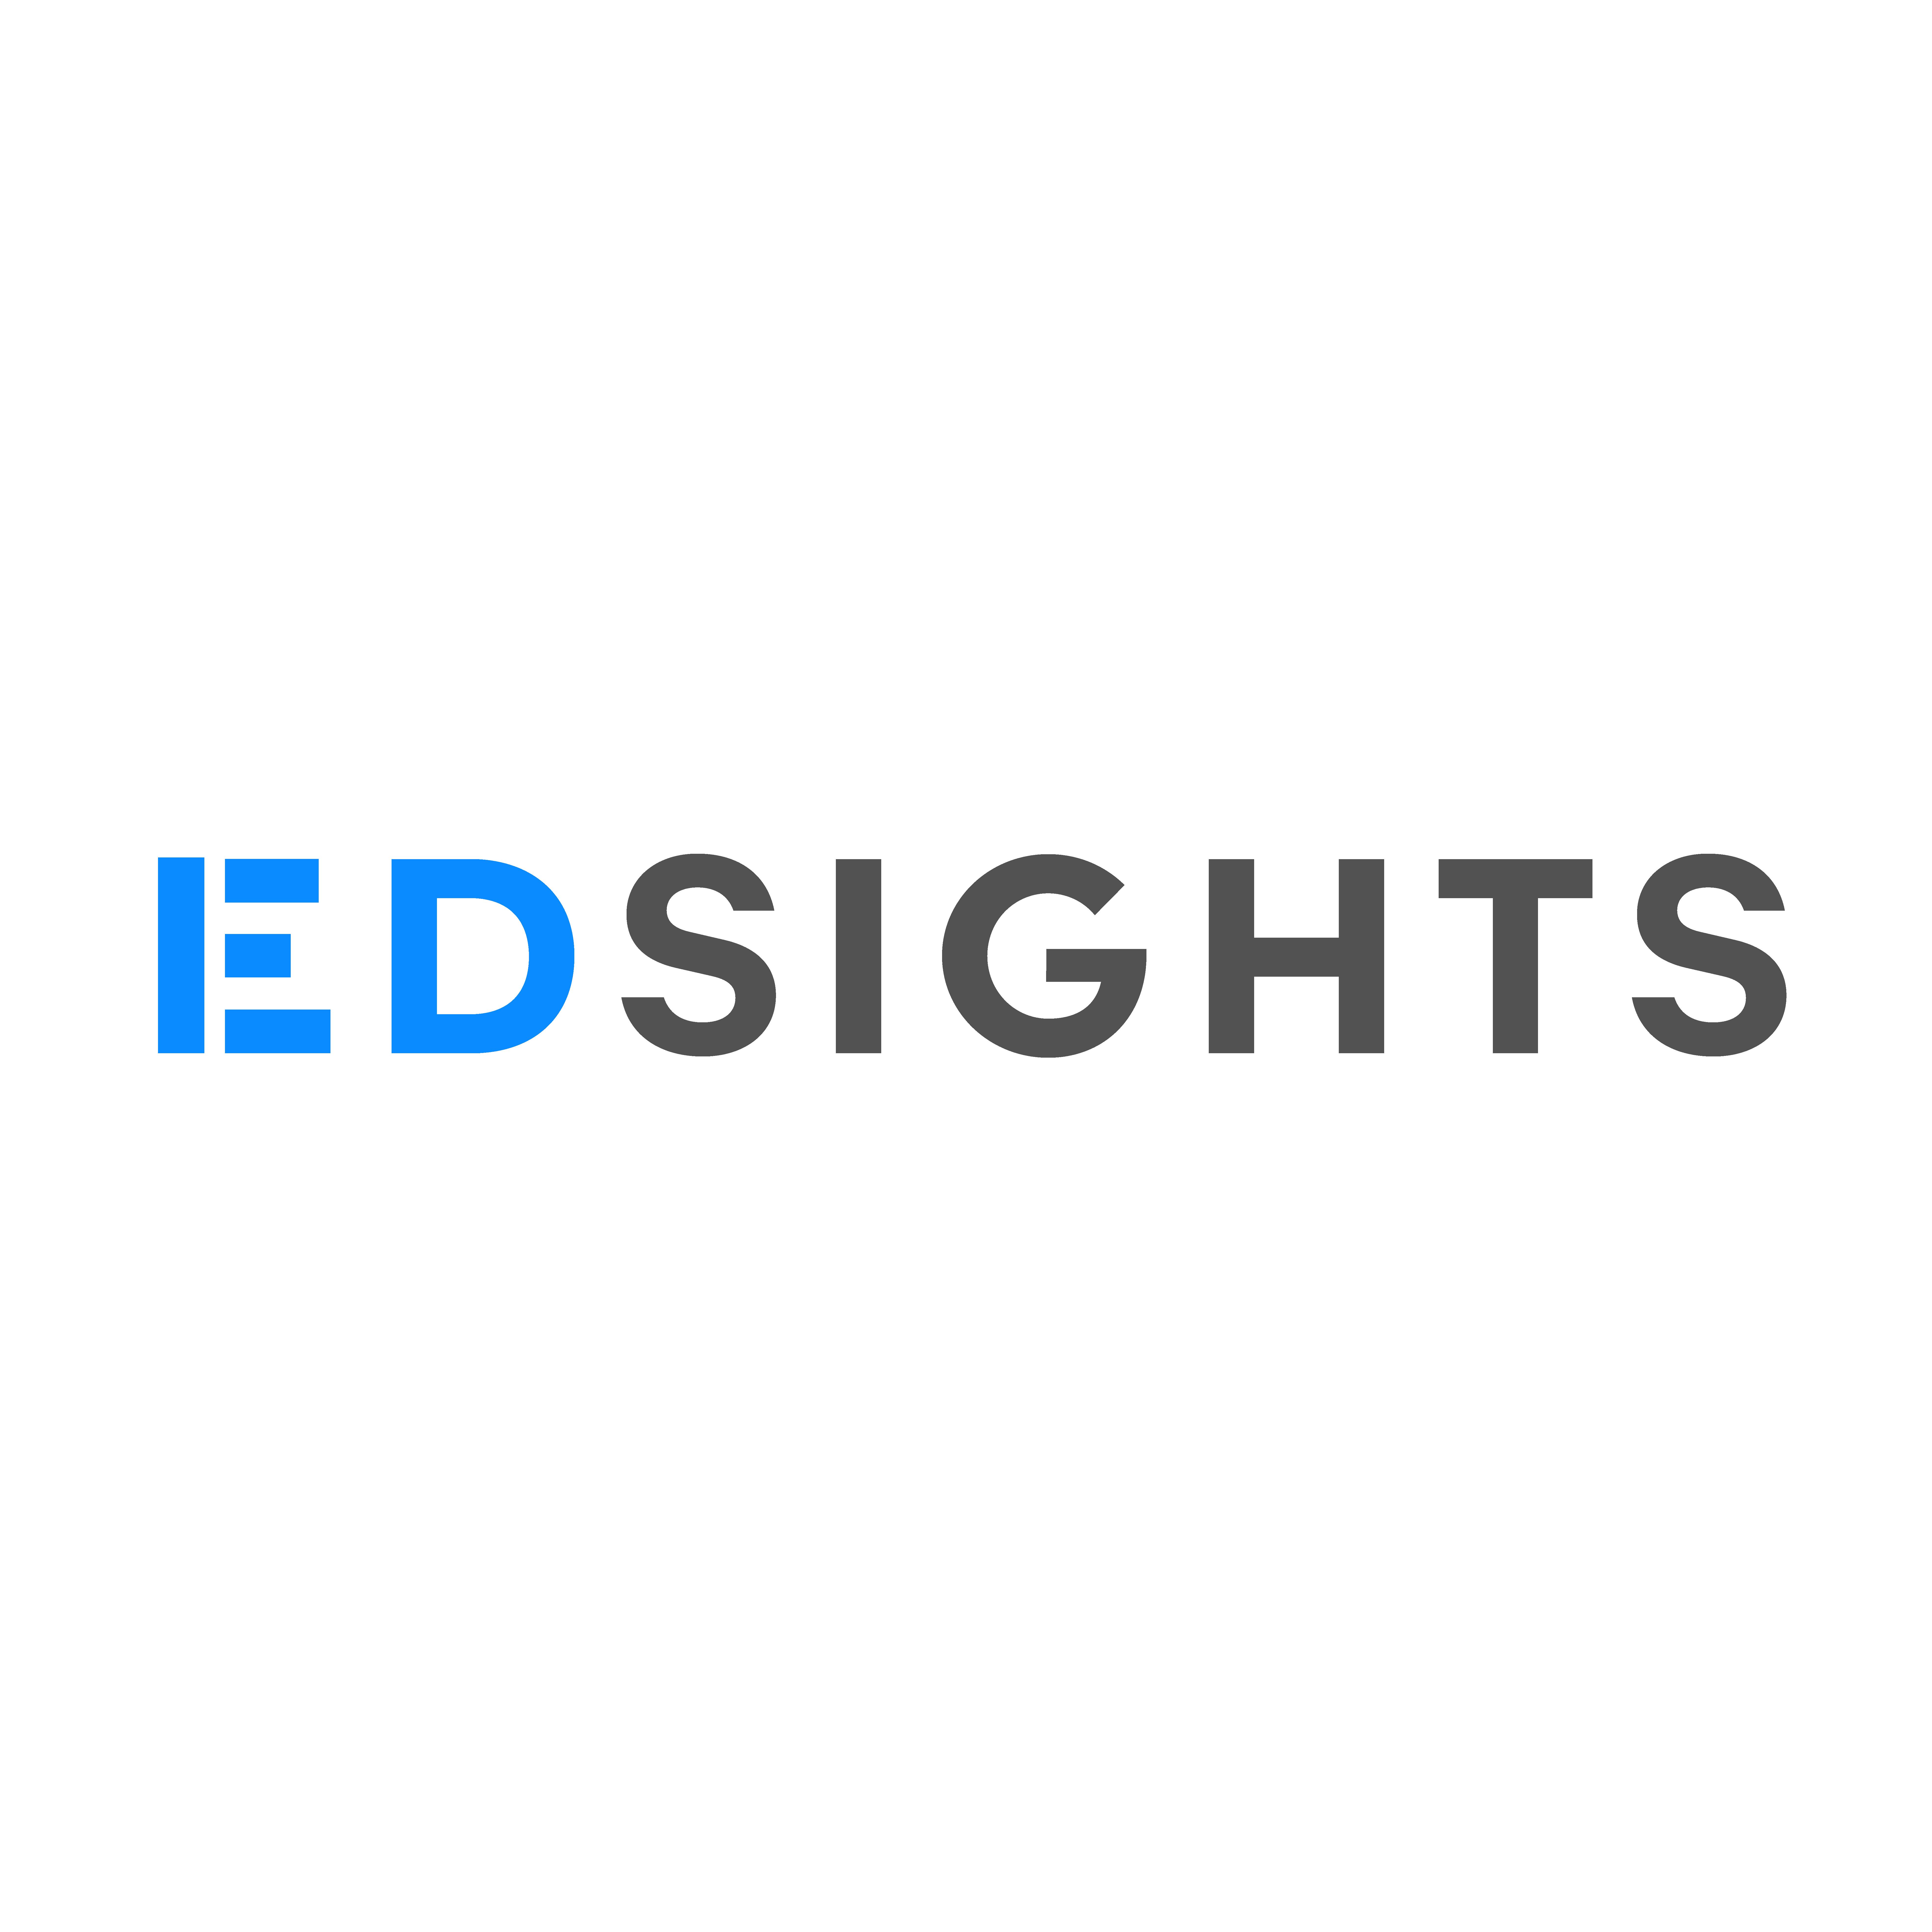 EDSIGHTS, INC